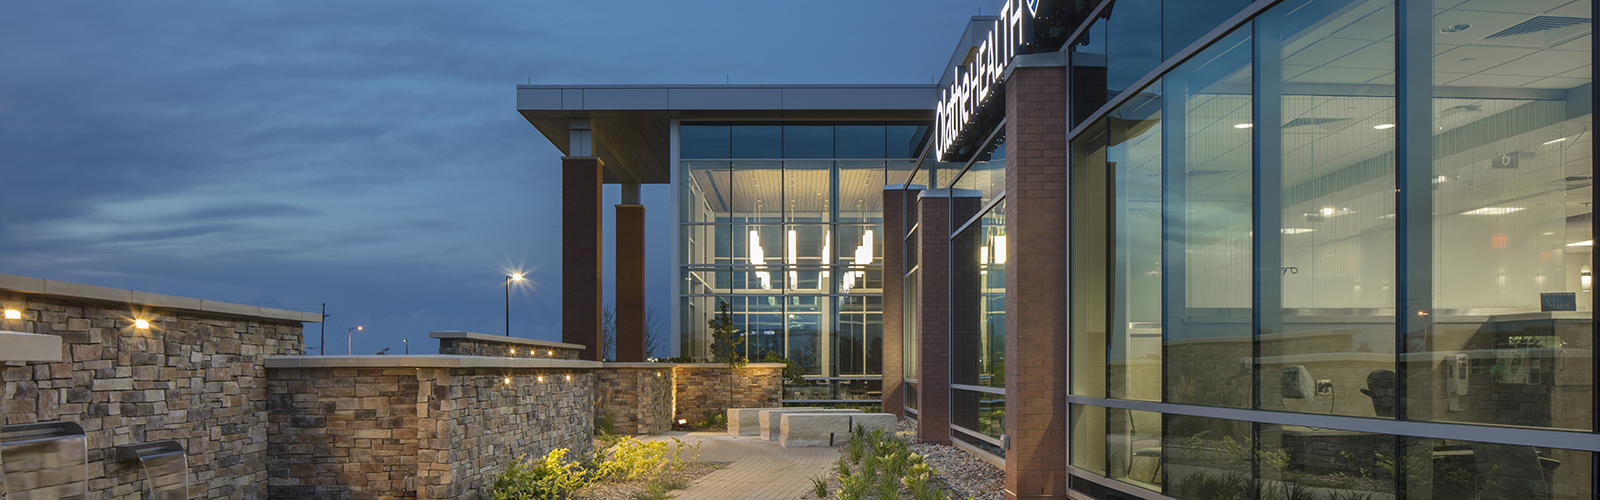 Olathe Medical Center - Cancer Center 4